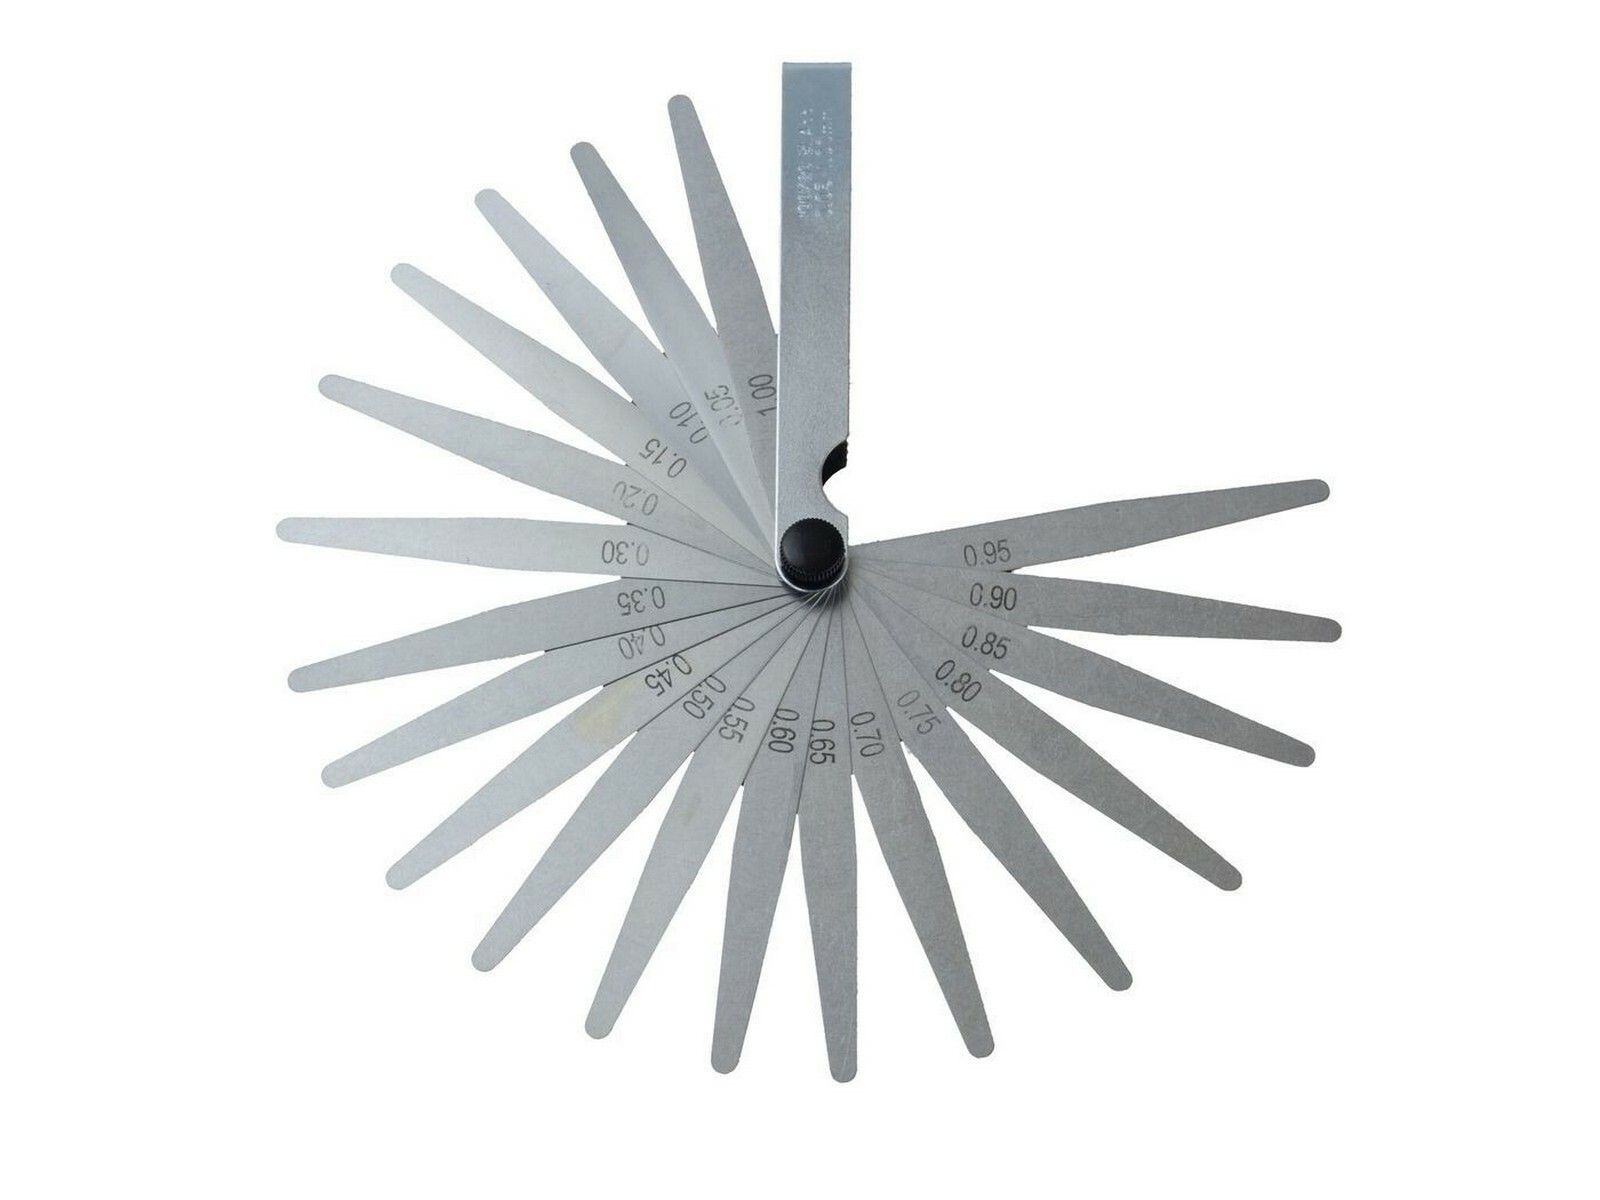 Měrky spárové, 20ks, 0,05-1mm GEKO